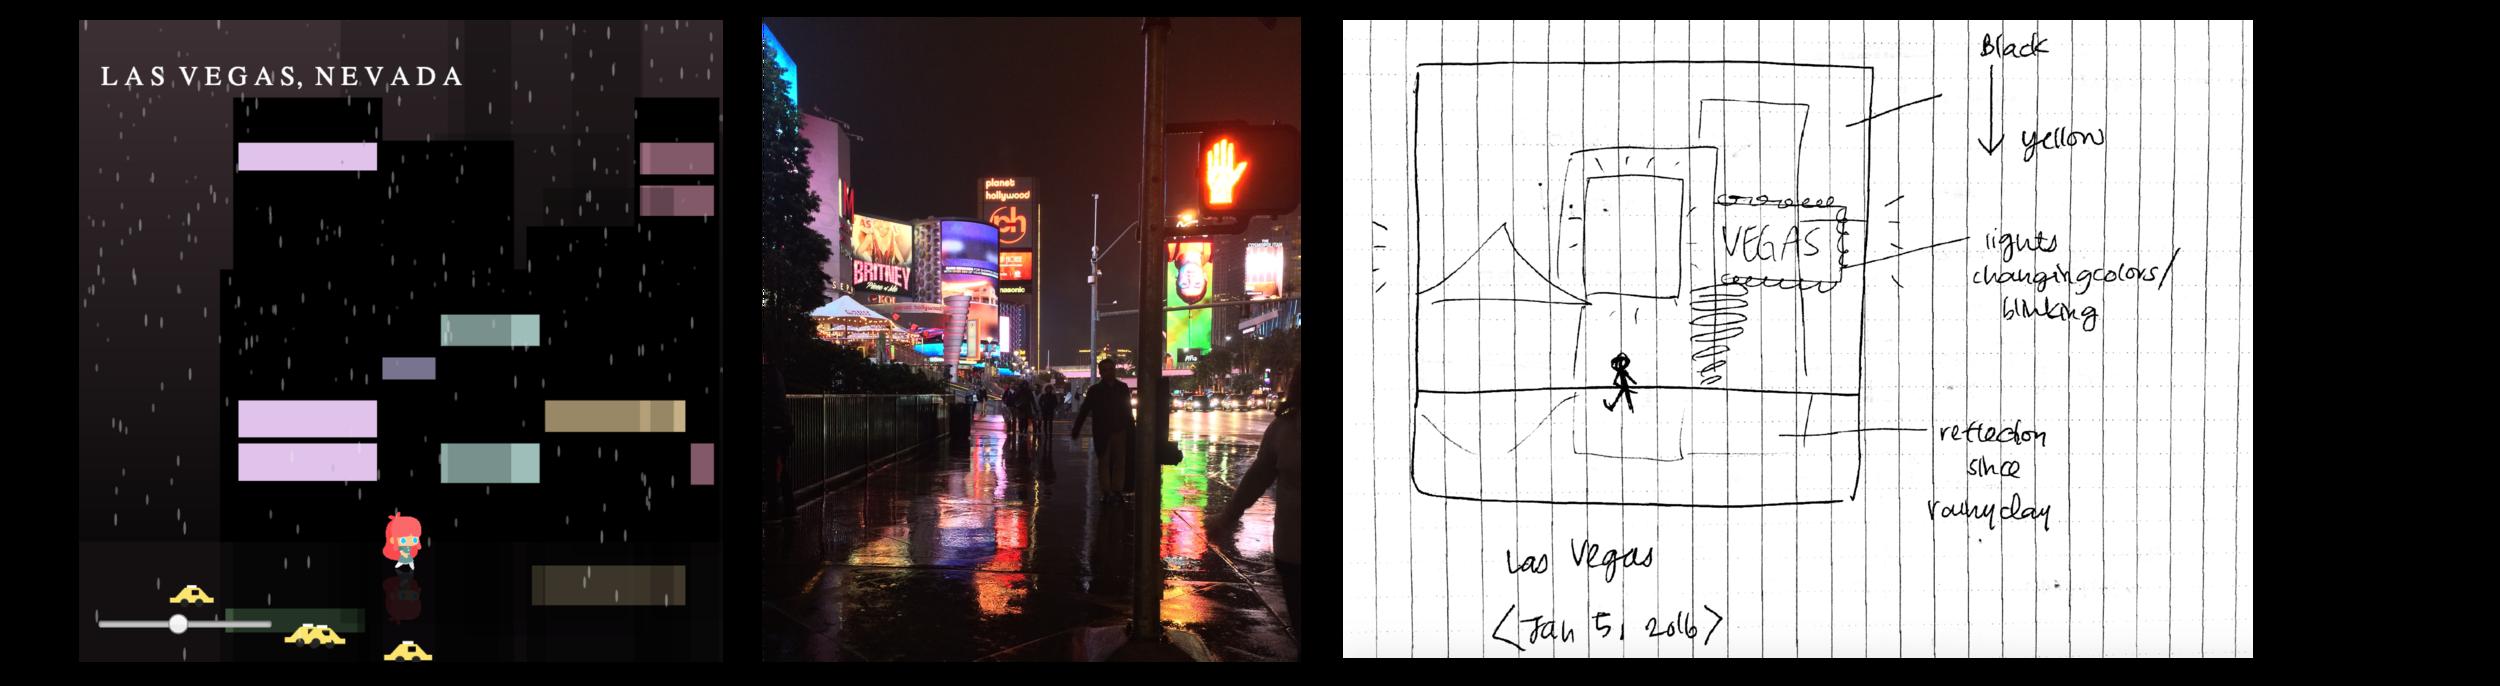 Scene 3 – Rainy Las Vegas